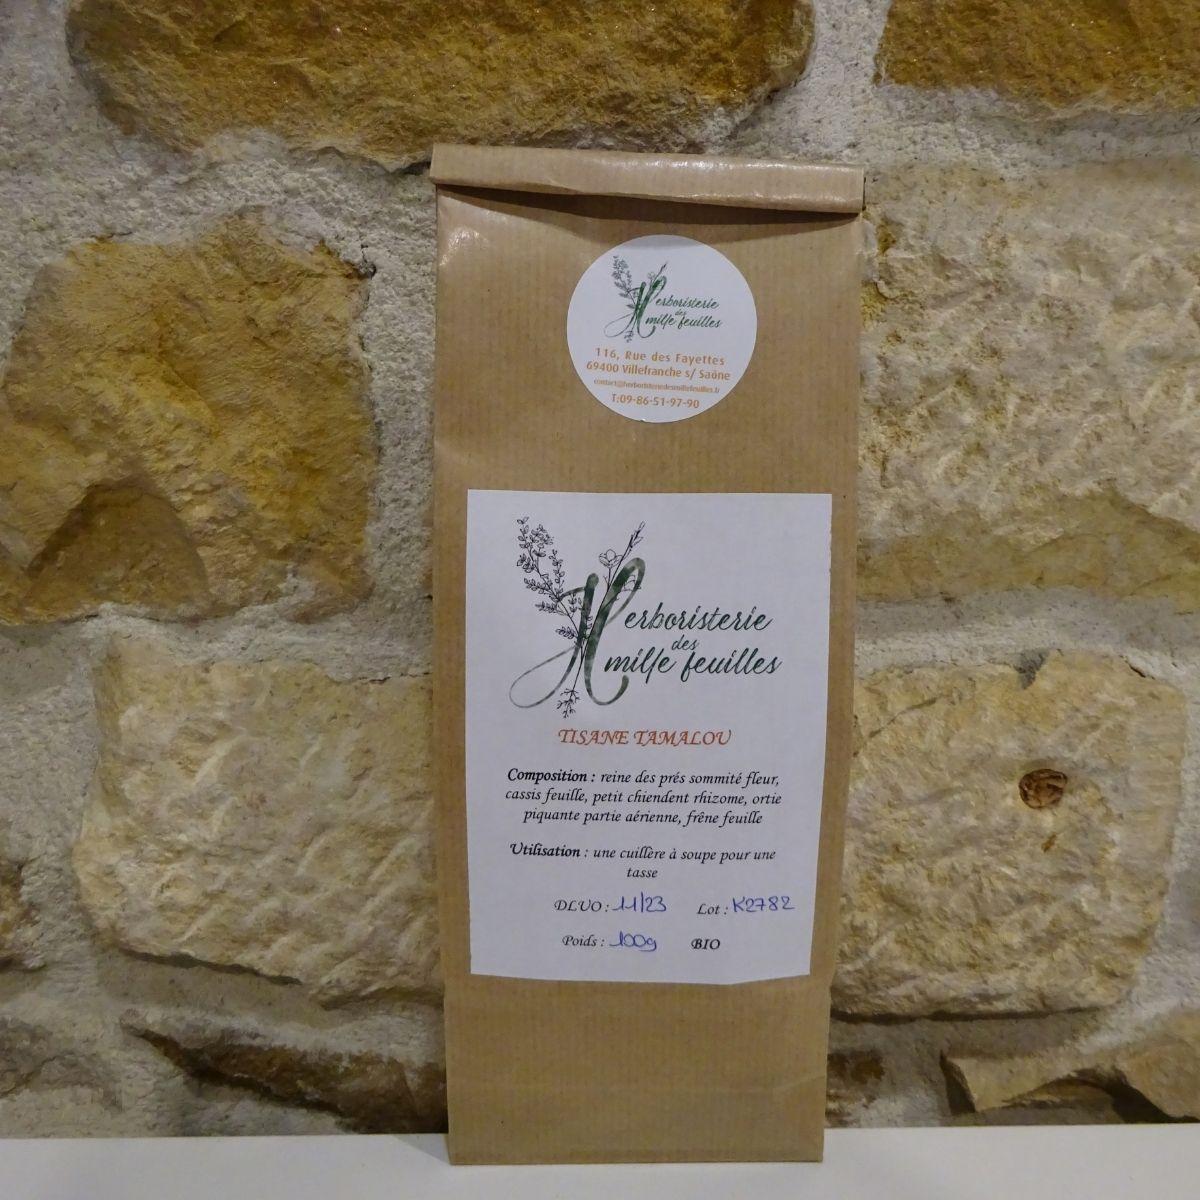 tisane mélange bio tamalou herboristerie des mille feuilles